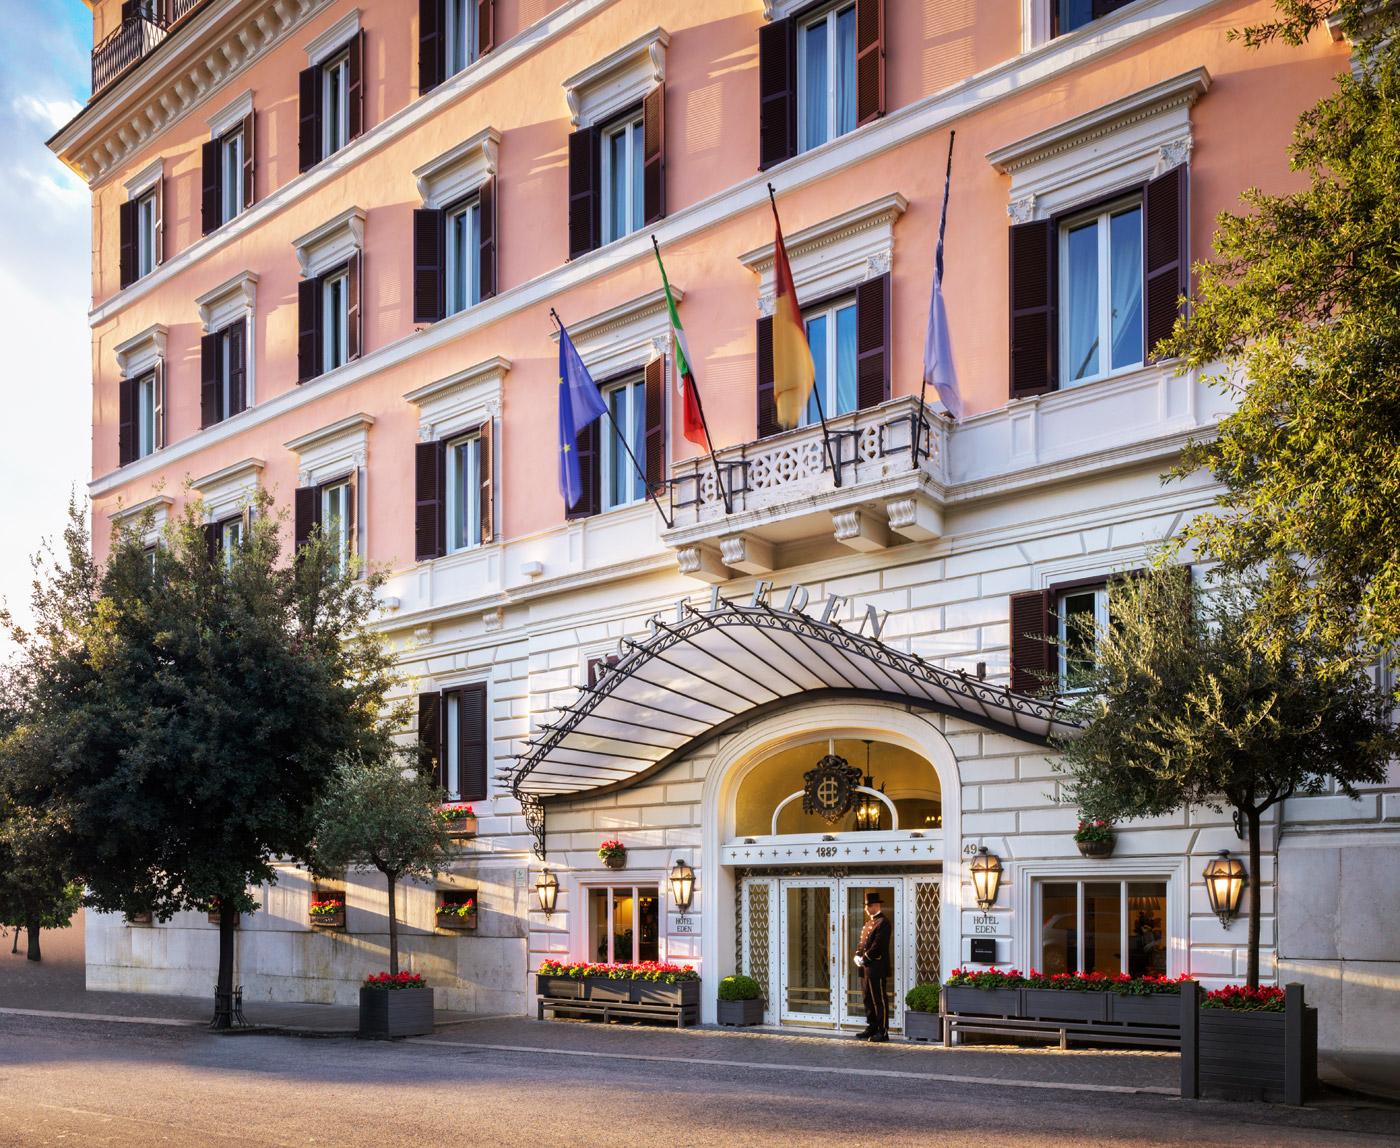 Rome S Luxurious Hotel Eden Celebrates Its 130th Anniversary